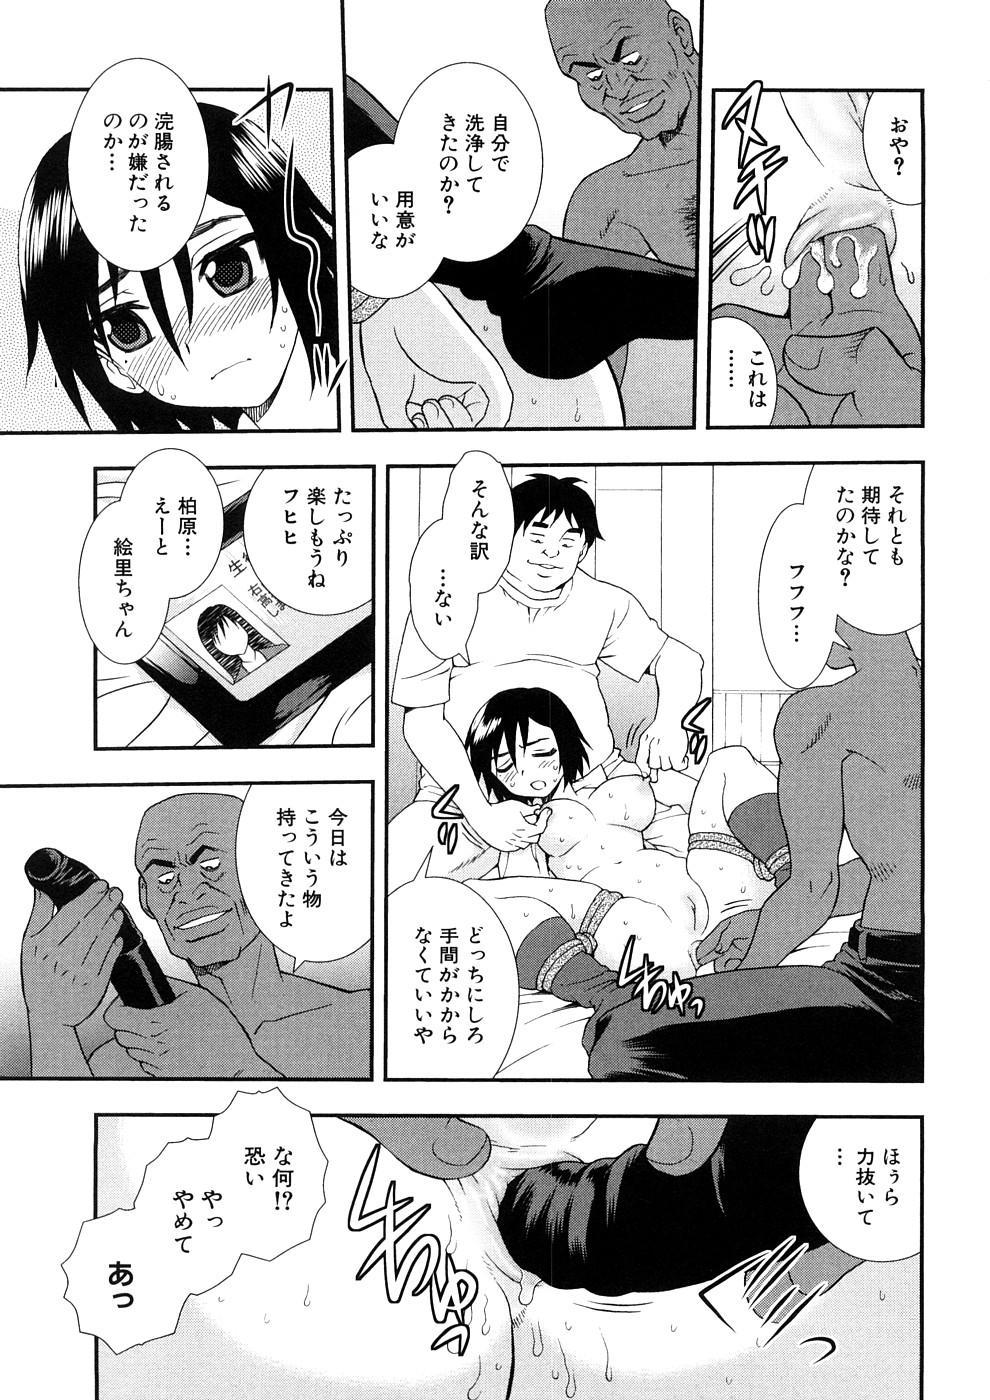 Geki Yaba Anthology Vol. 1 - Naka ni Dashite yo 179